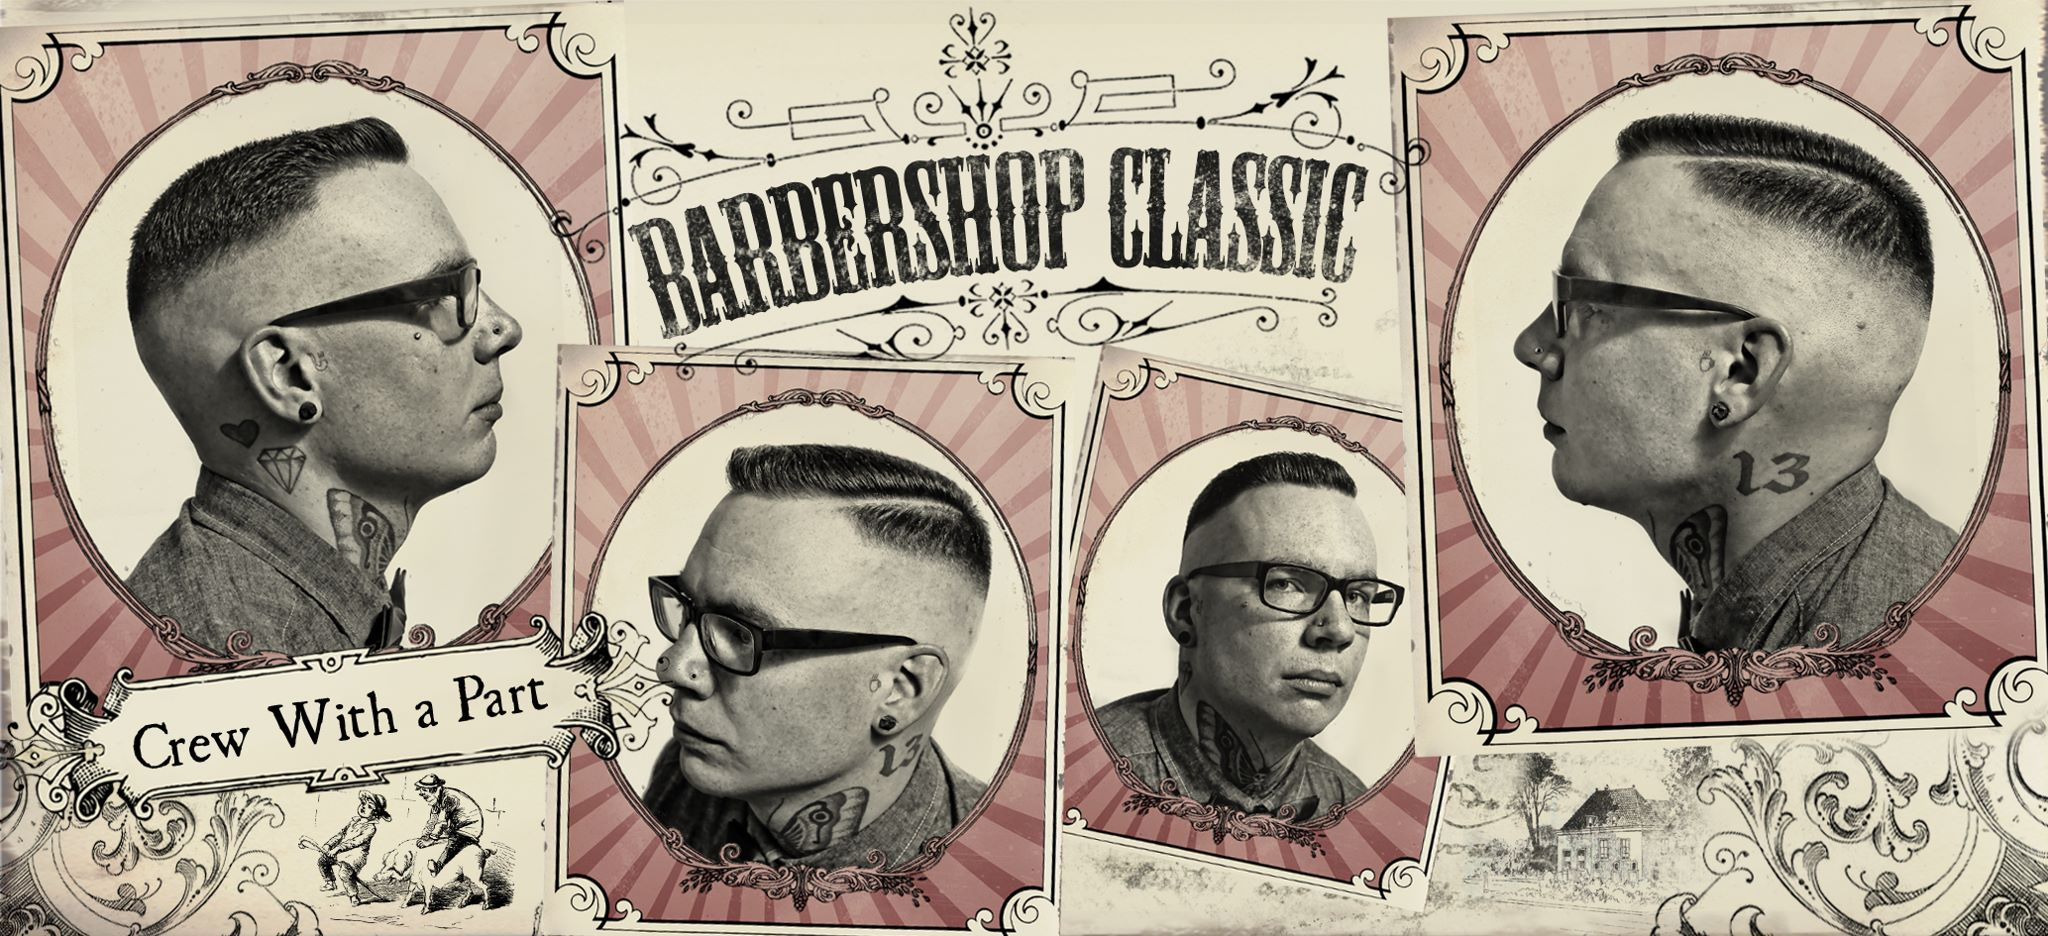 Barber Hair Styles: Signature Haircuts / Barbershop